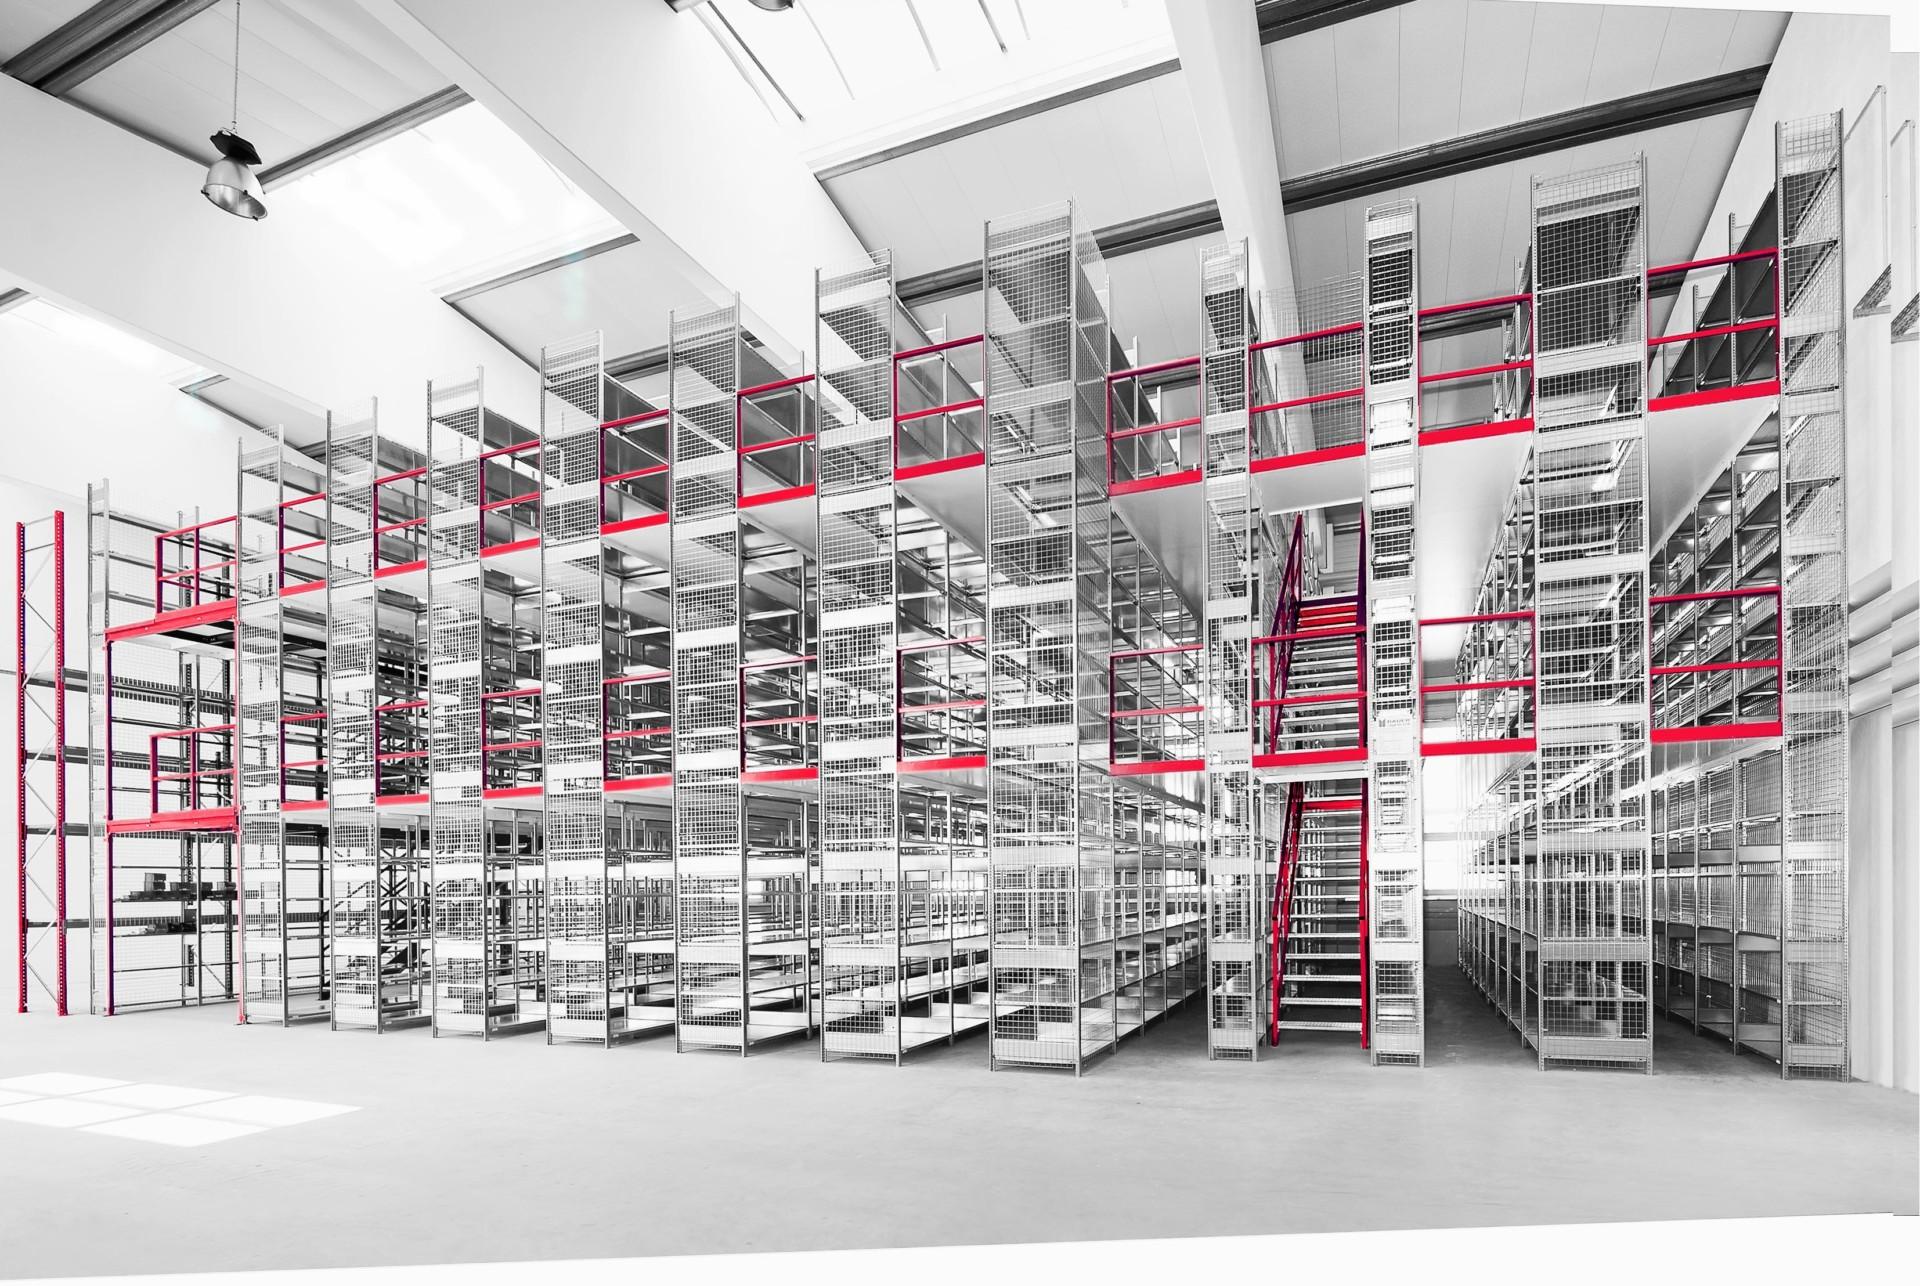 Multi-storey shelving systems